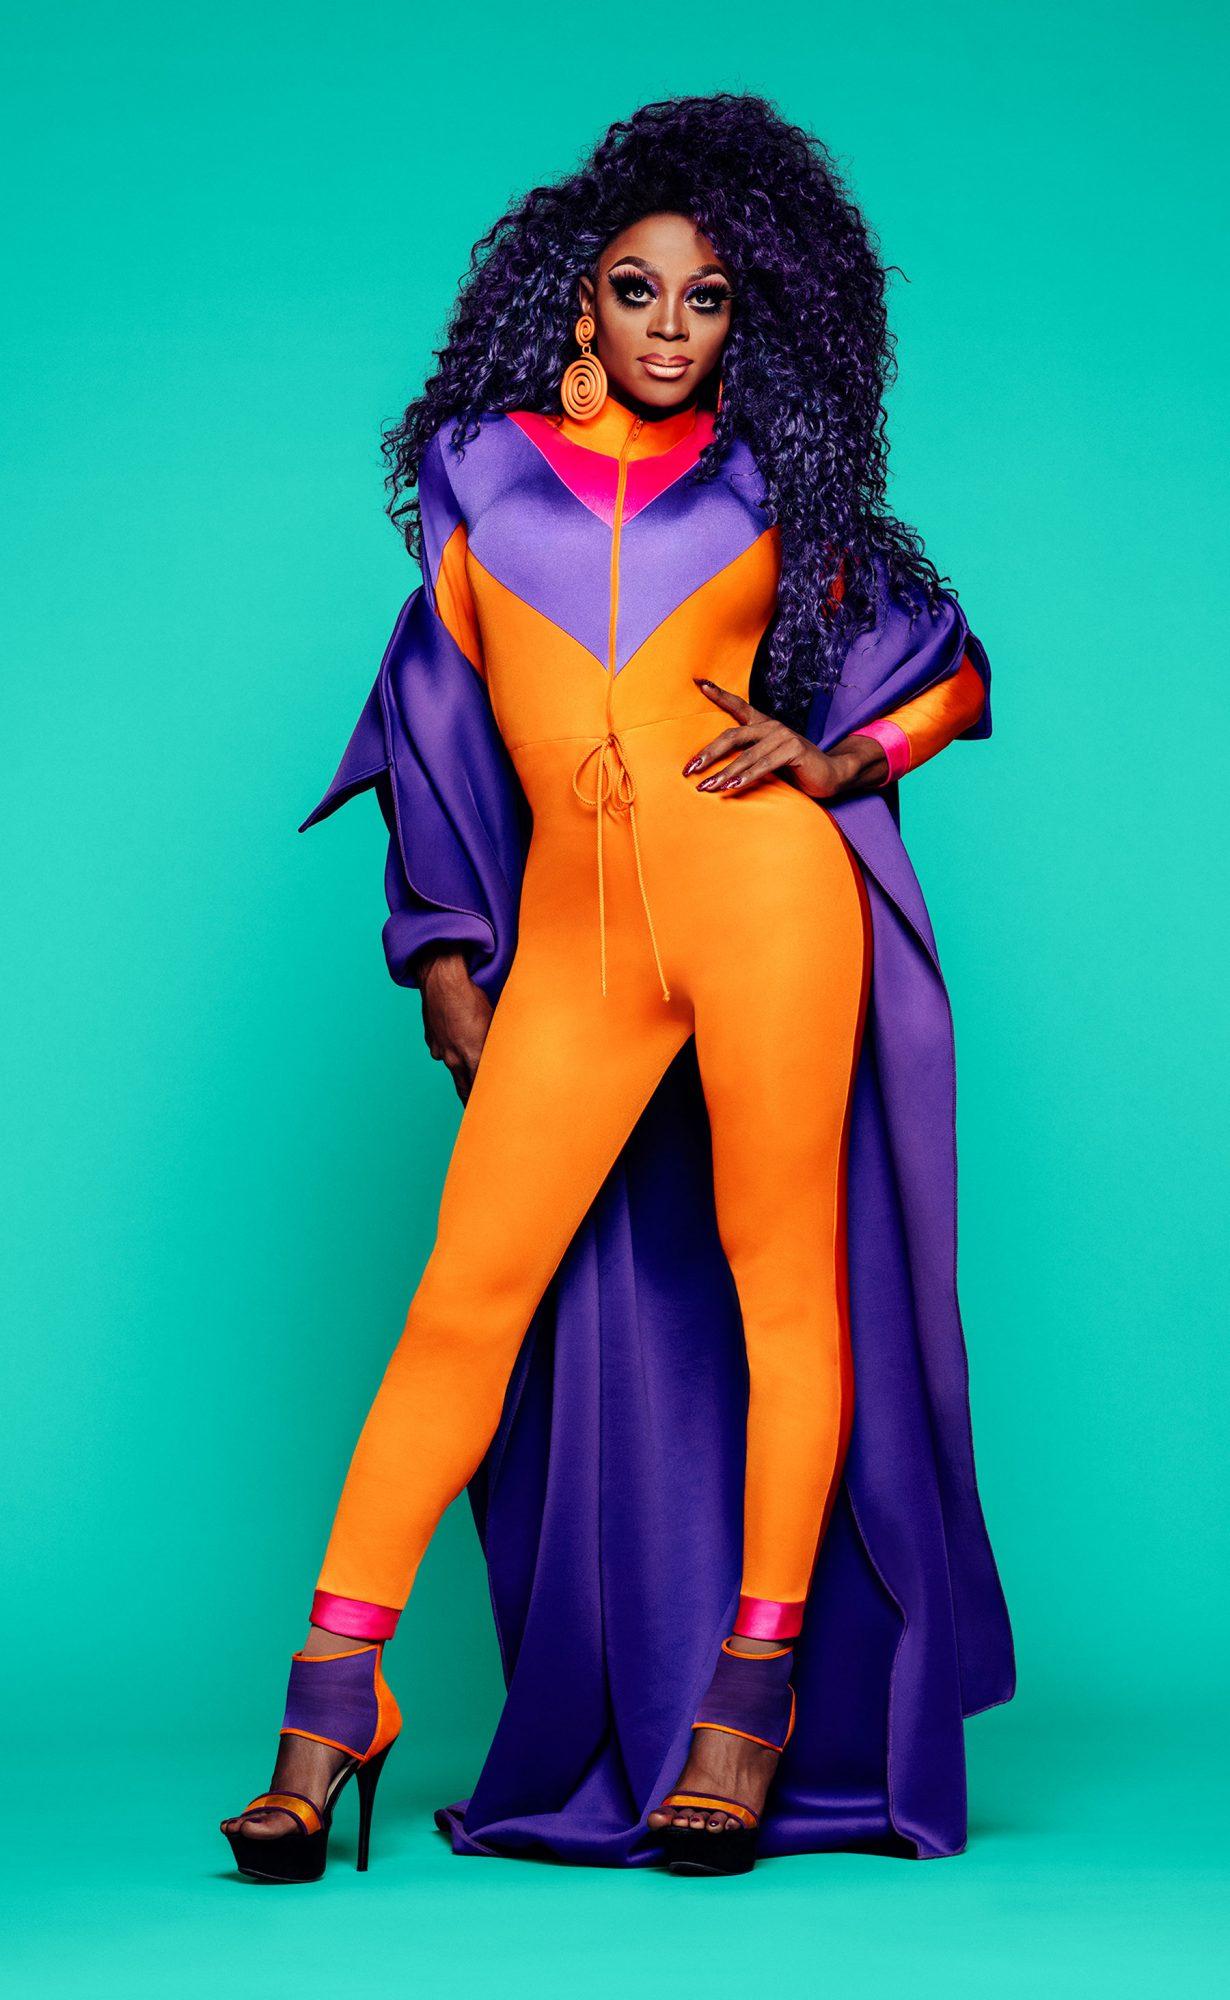 RuPaul Drag Race Season 11 cast photo -- Pictured: Ra'jah D OharaCR: VH1